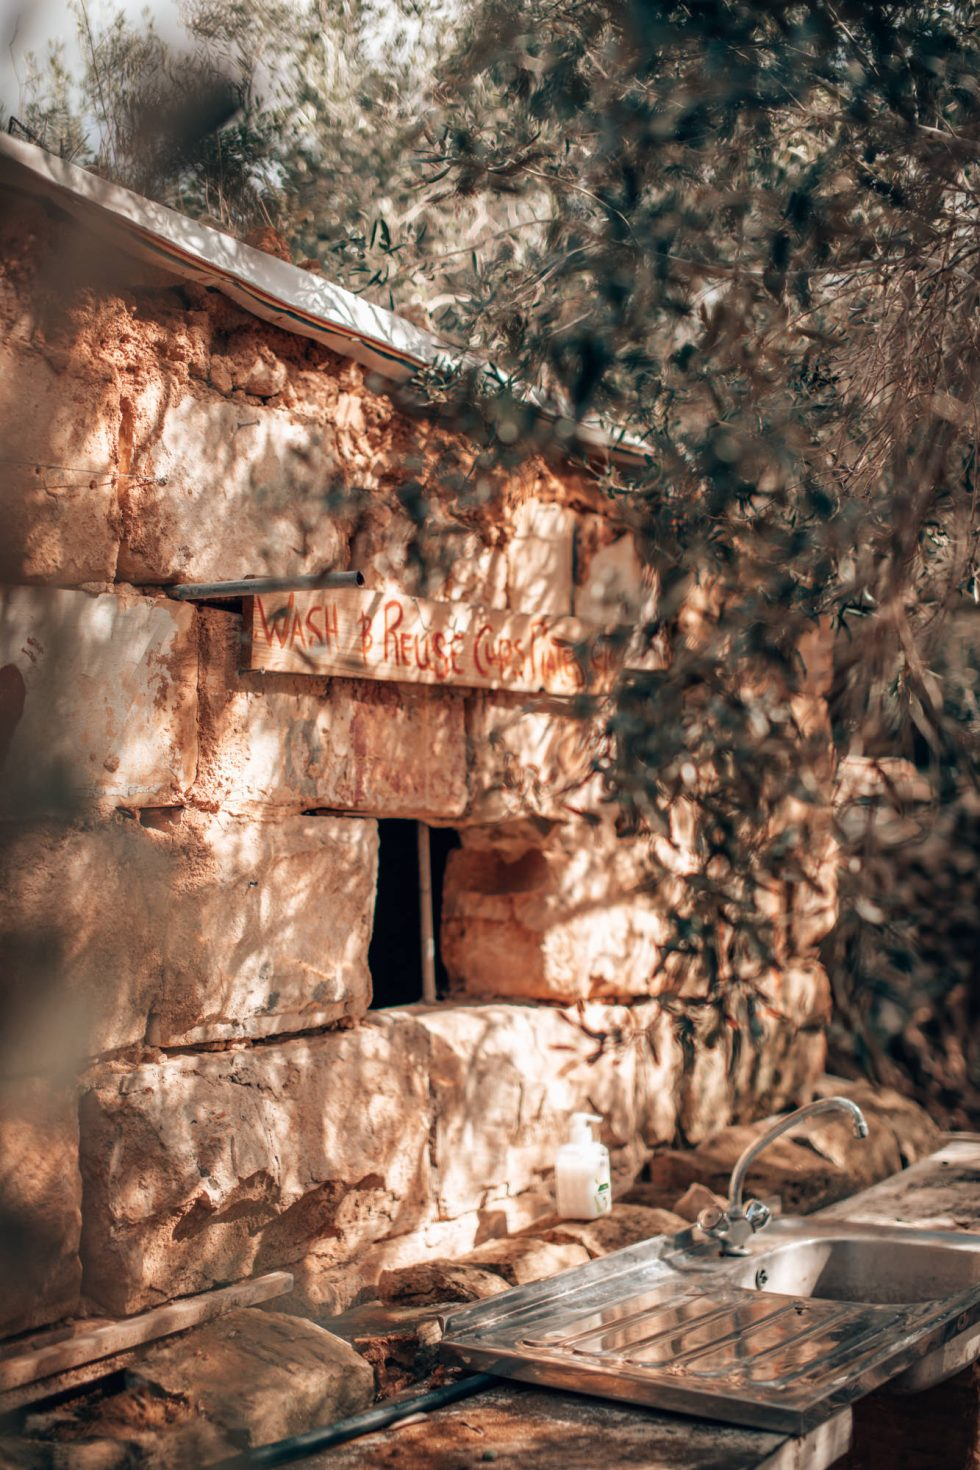 malta-travel-lifestyle-photographer-laura-g-diaz-9